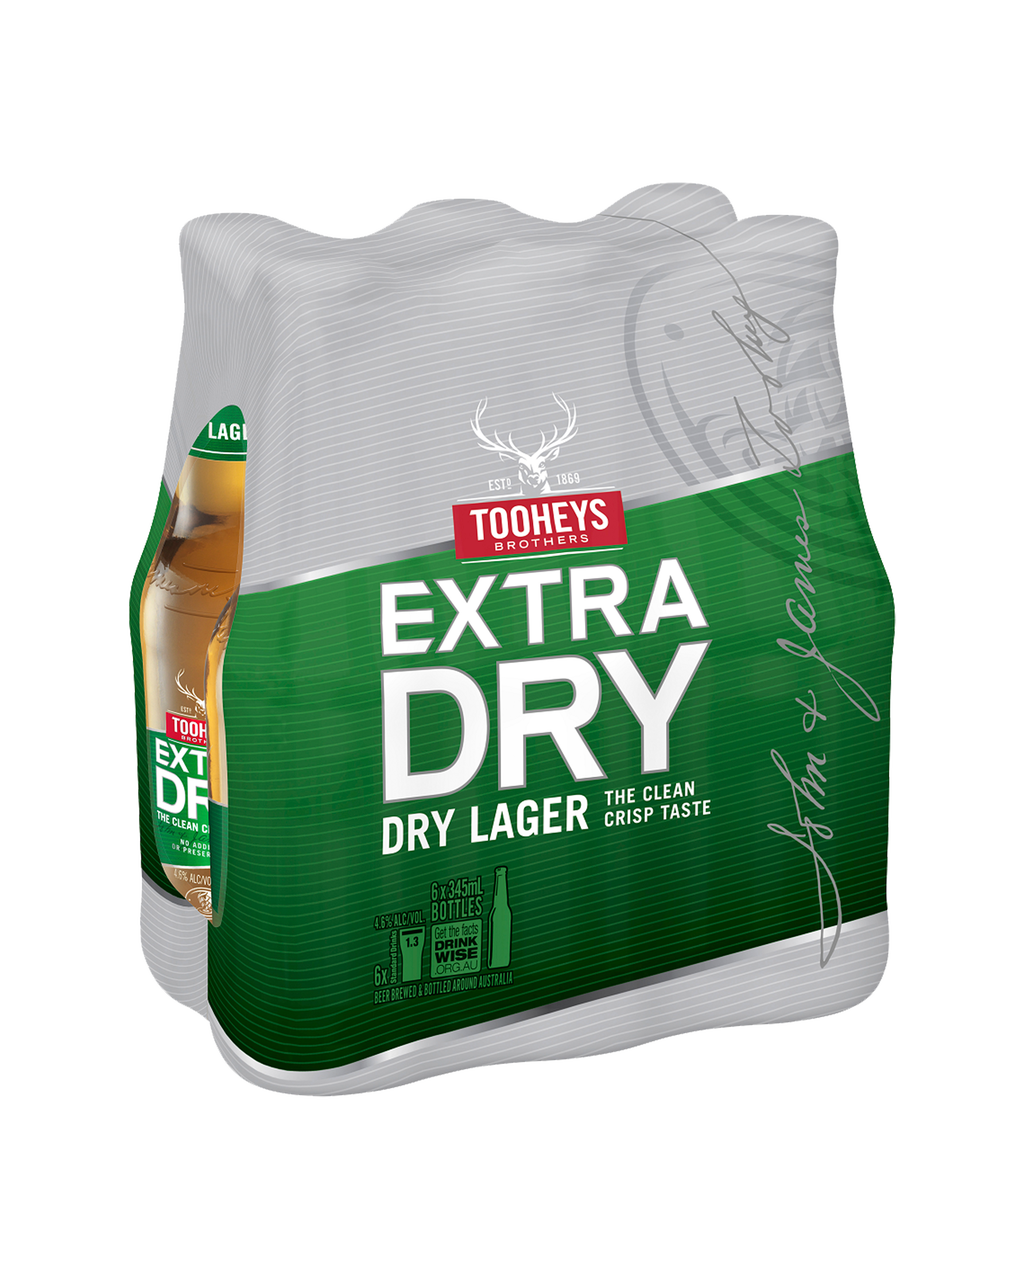 Tooheys Extra Dry 24 x 345ml Stubbies